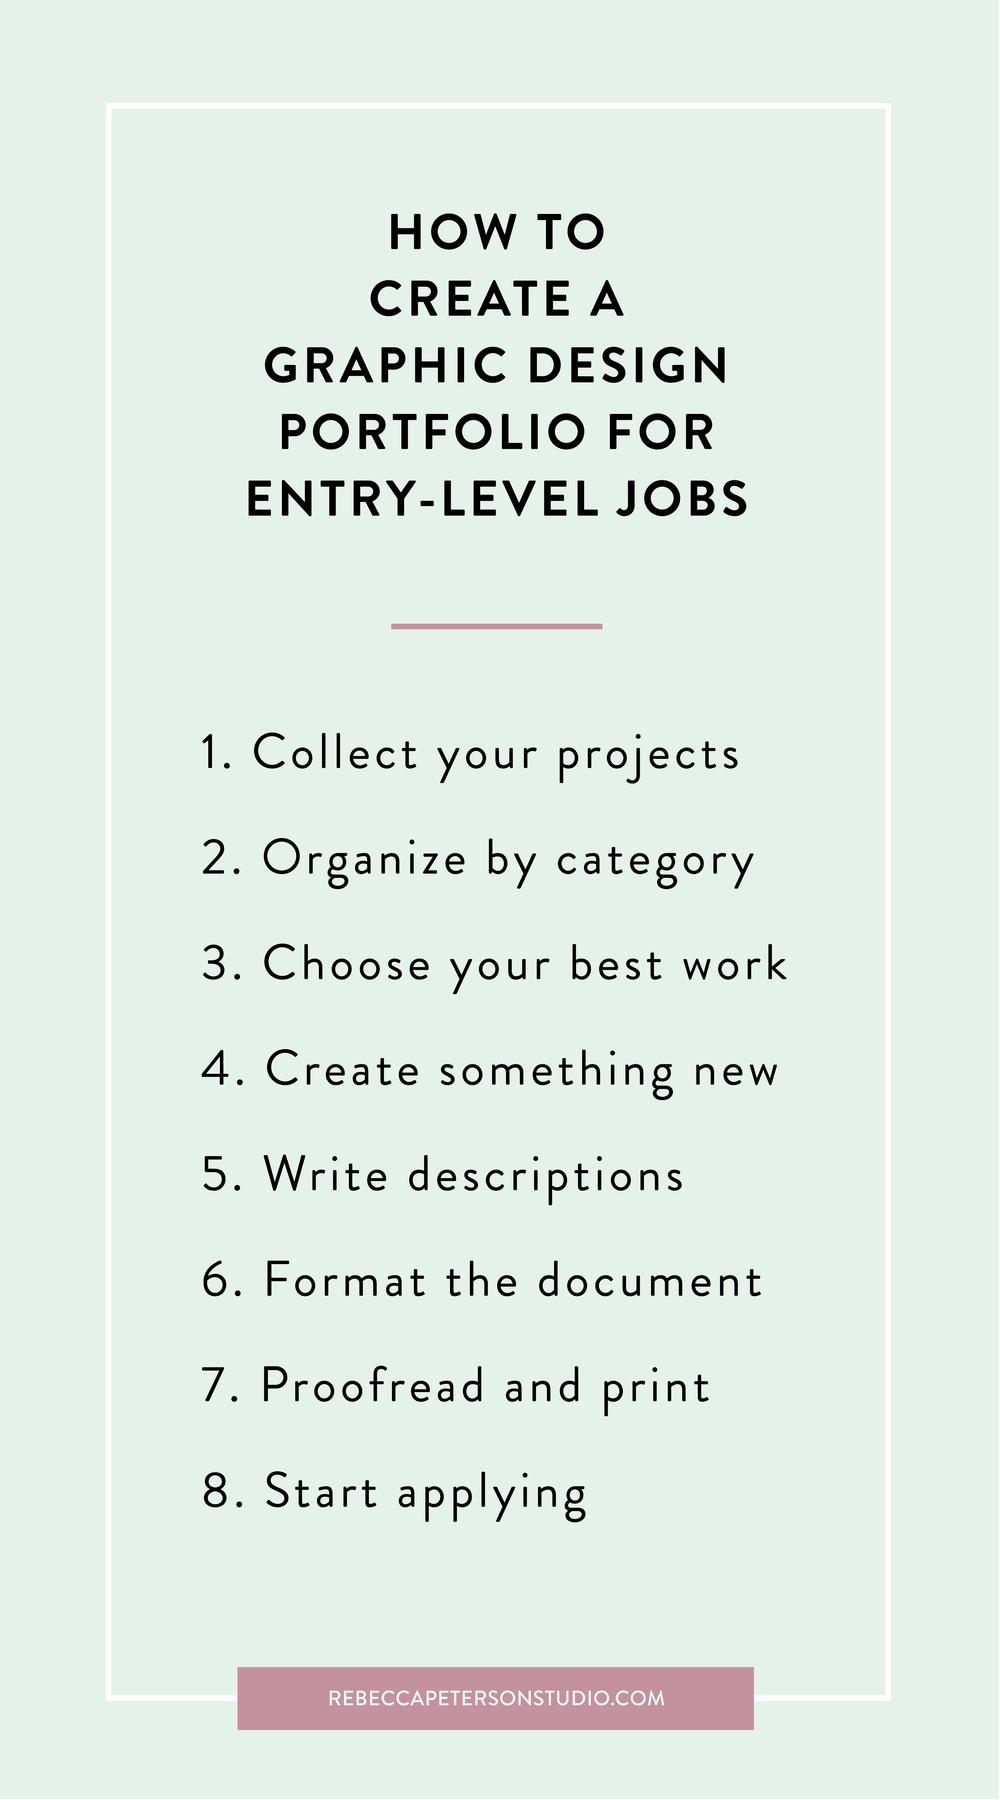 How To Create A Graphic Design Portfolio For Entry Level Jobs Rebecca Peterson Studio Entry Level Jobs Graphic Designer Portfolio Graphic Design Portfolio